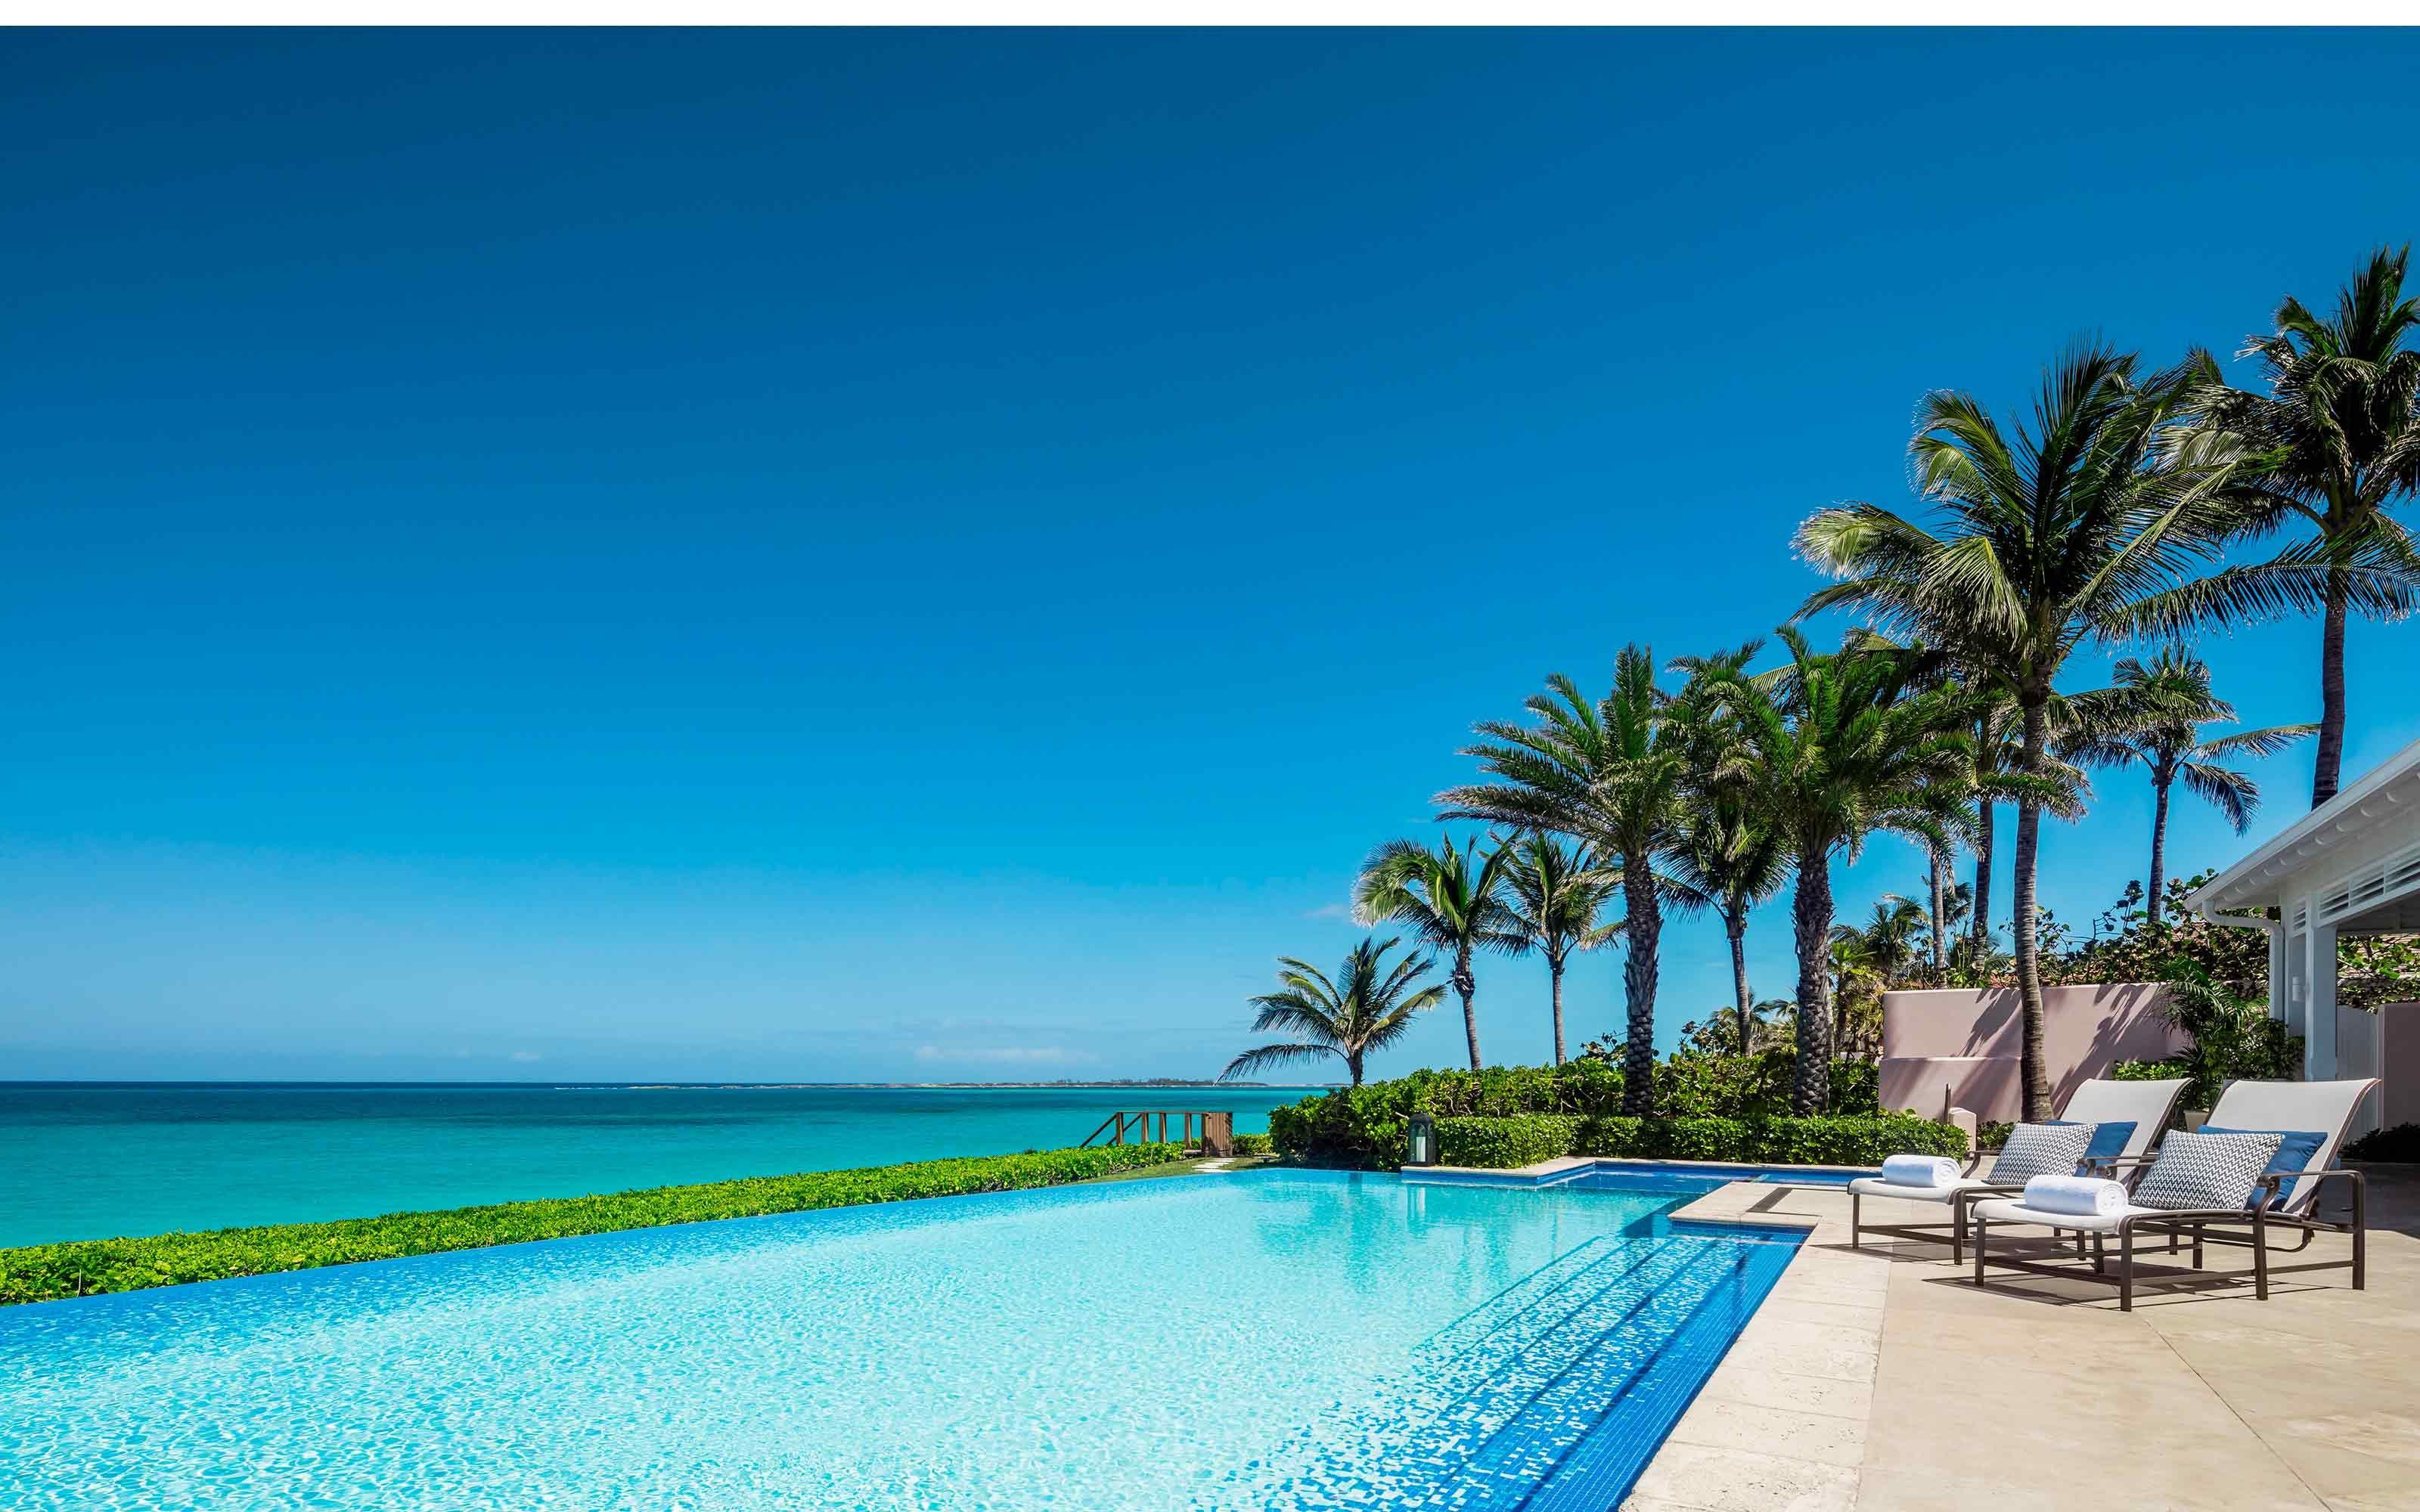 Ocean Club Four Bedroom Villa Terrace Bahamas resorts